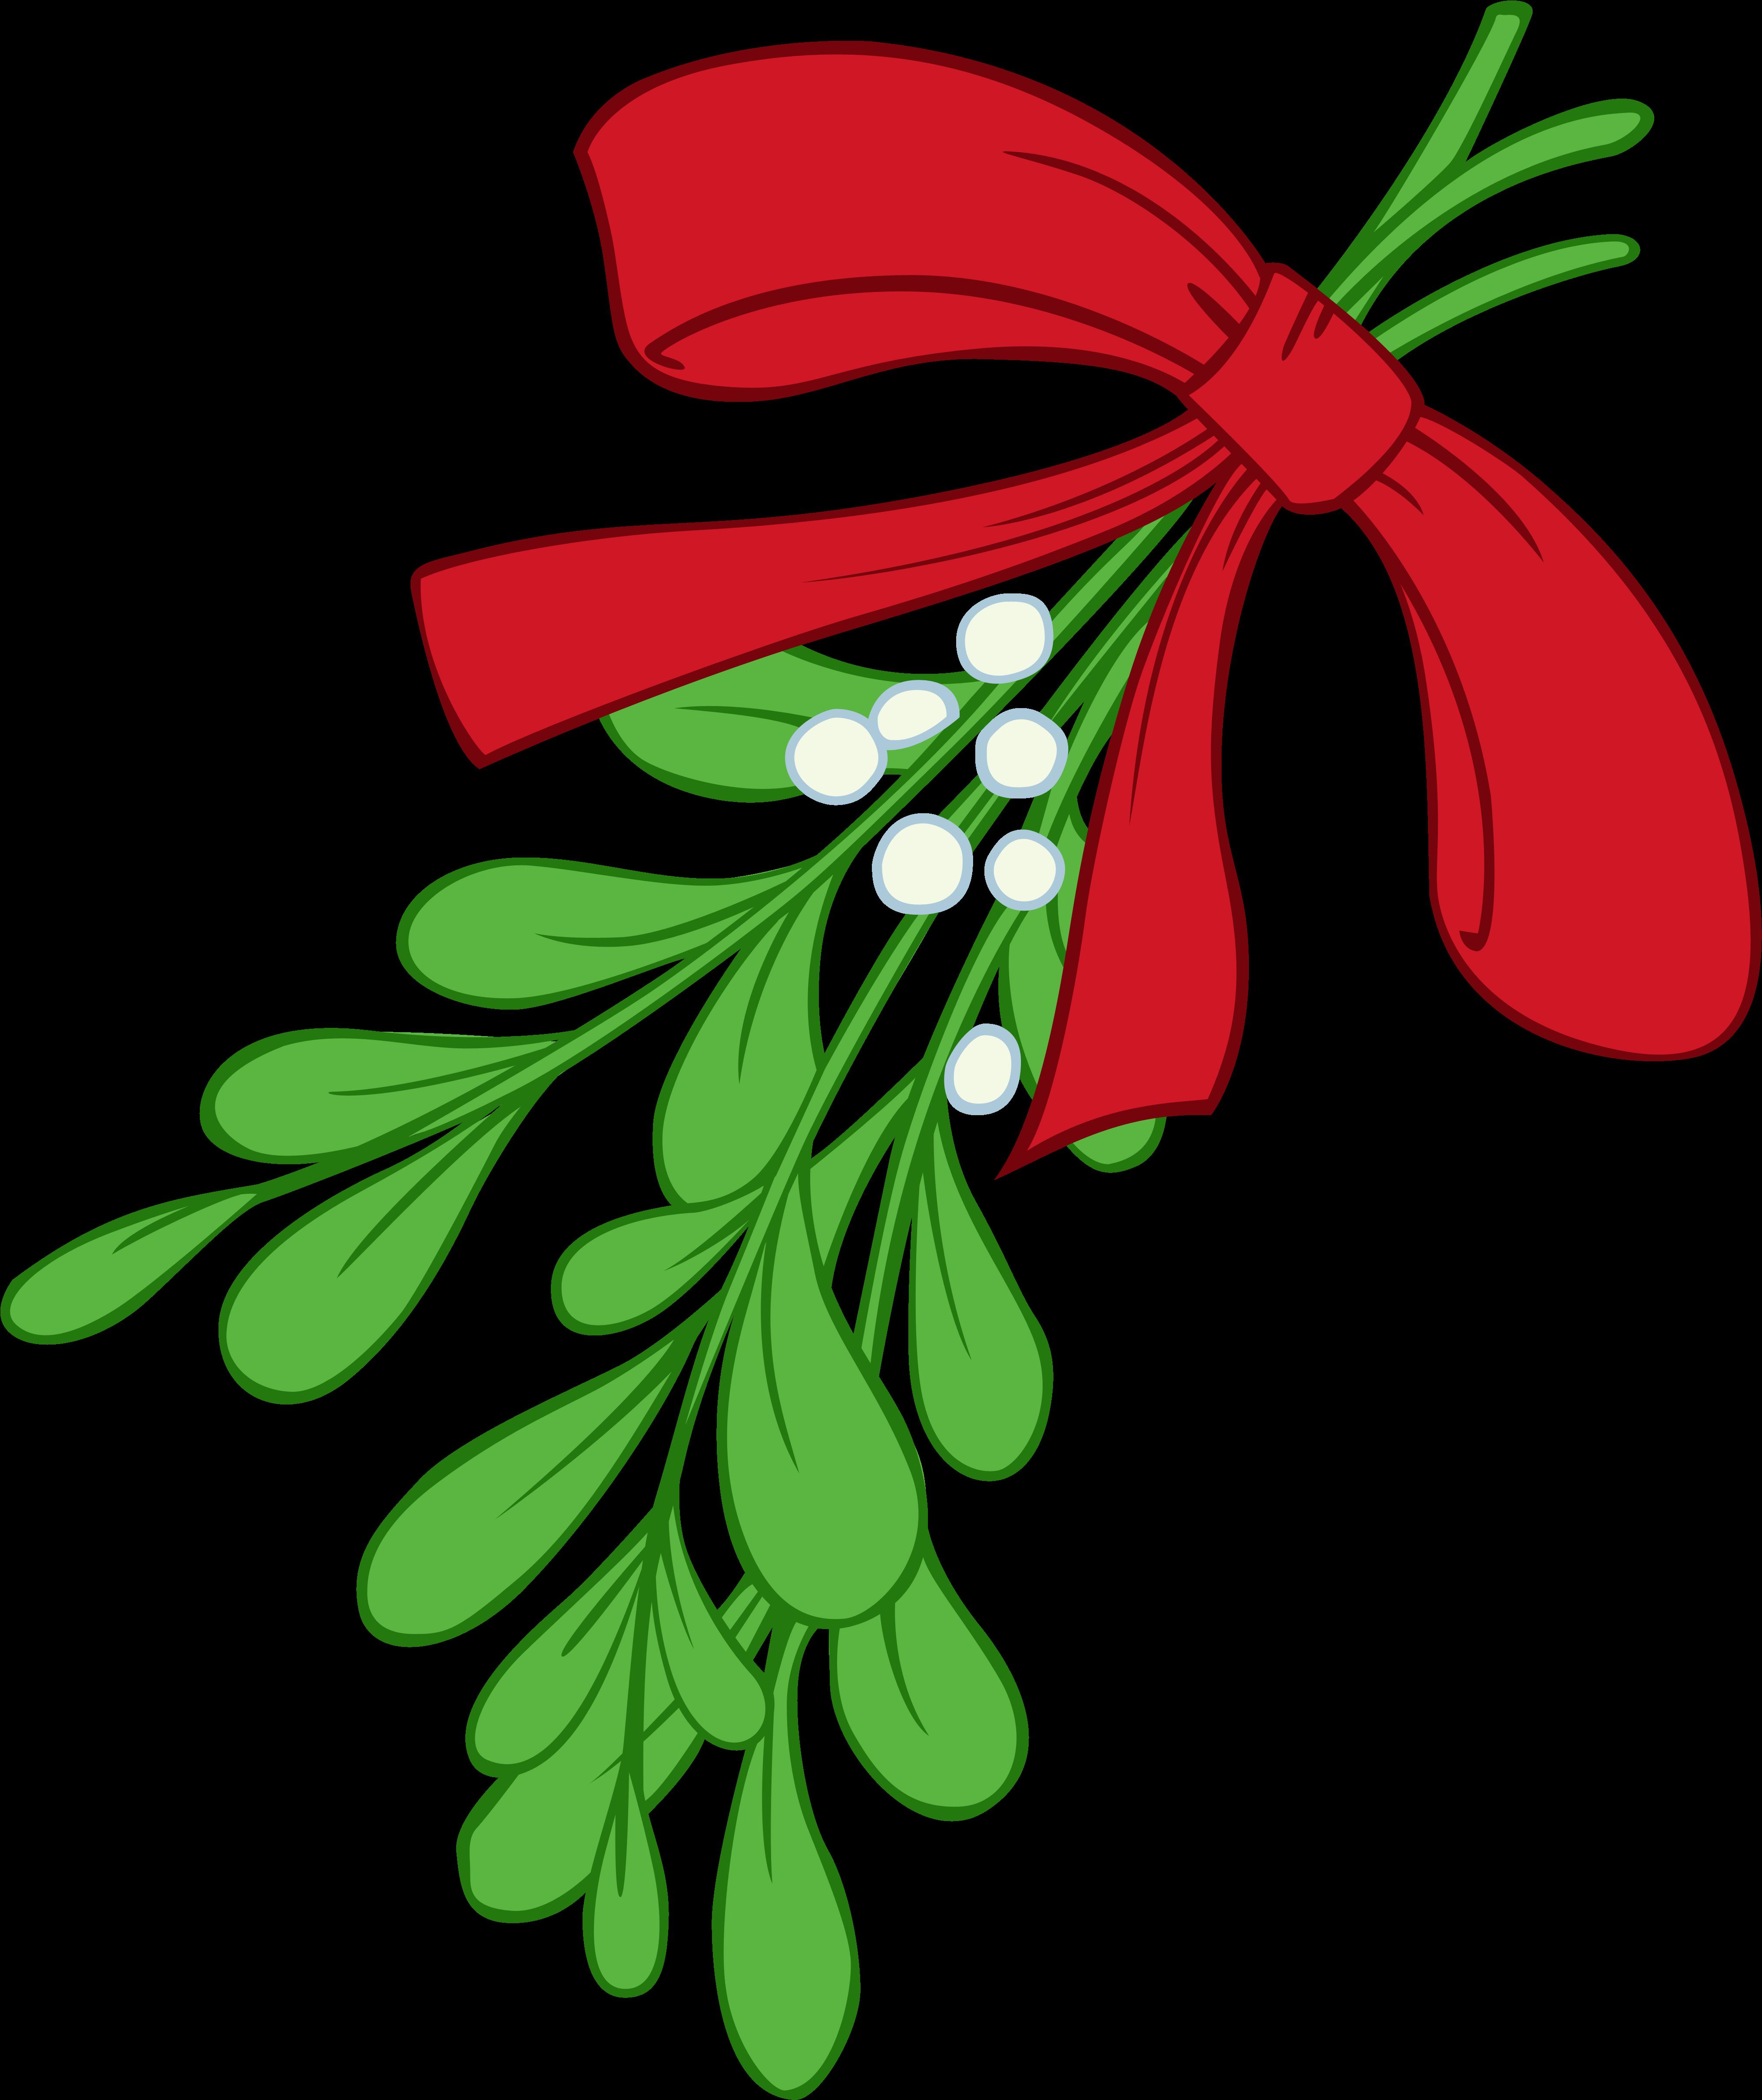 Mistletoe Clipart Ilration 72107 By Inkgraphics - Transparent Background Mistletoe Clipart - Png ...